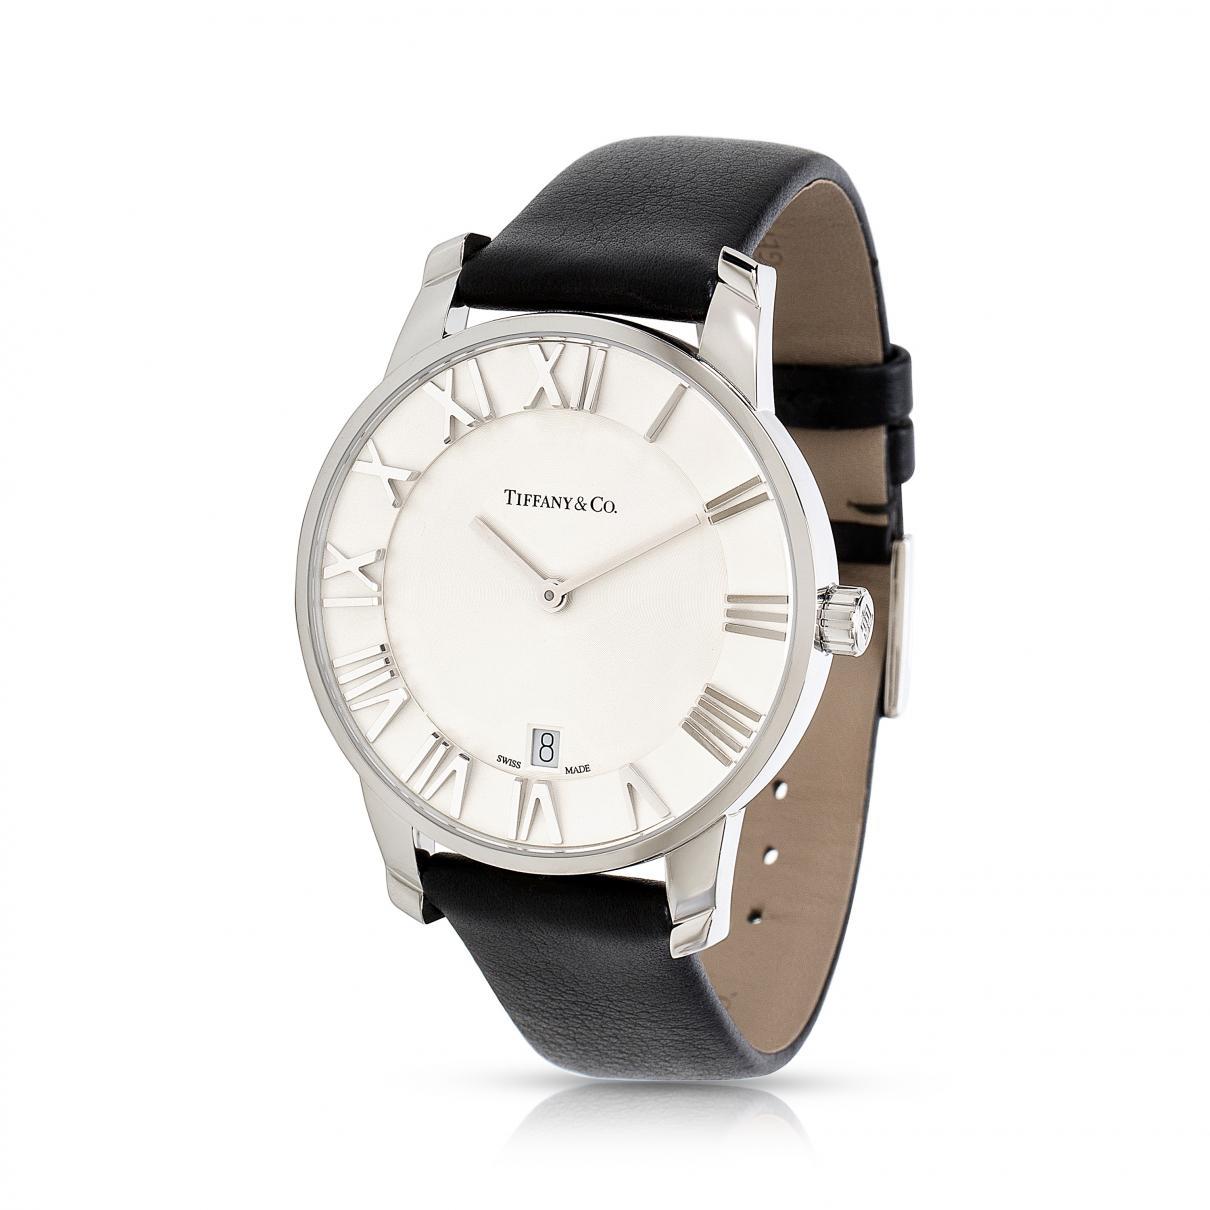 8313361f6b Tiffany   Co Watch in White - Lyst